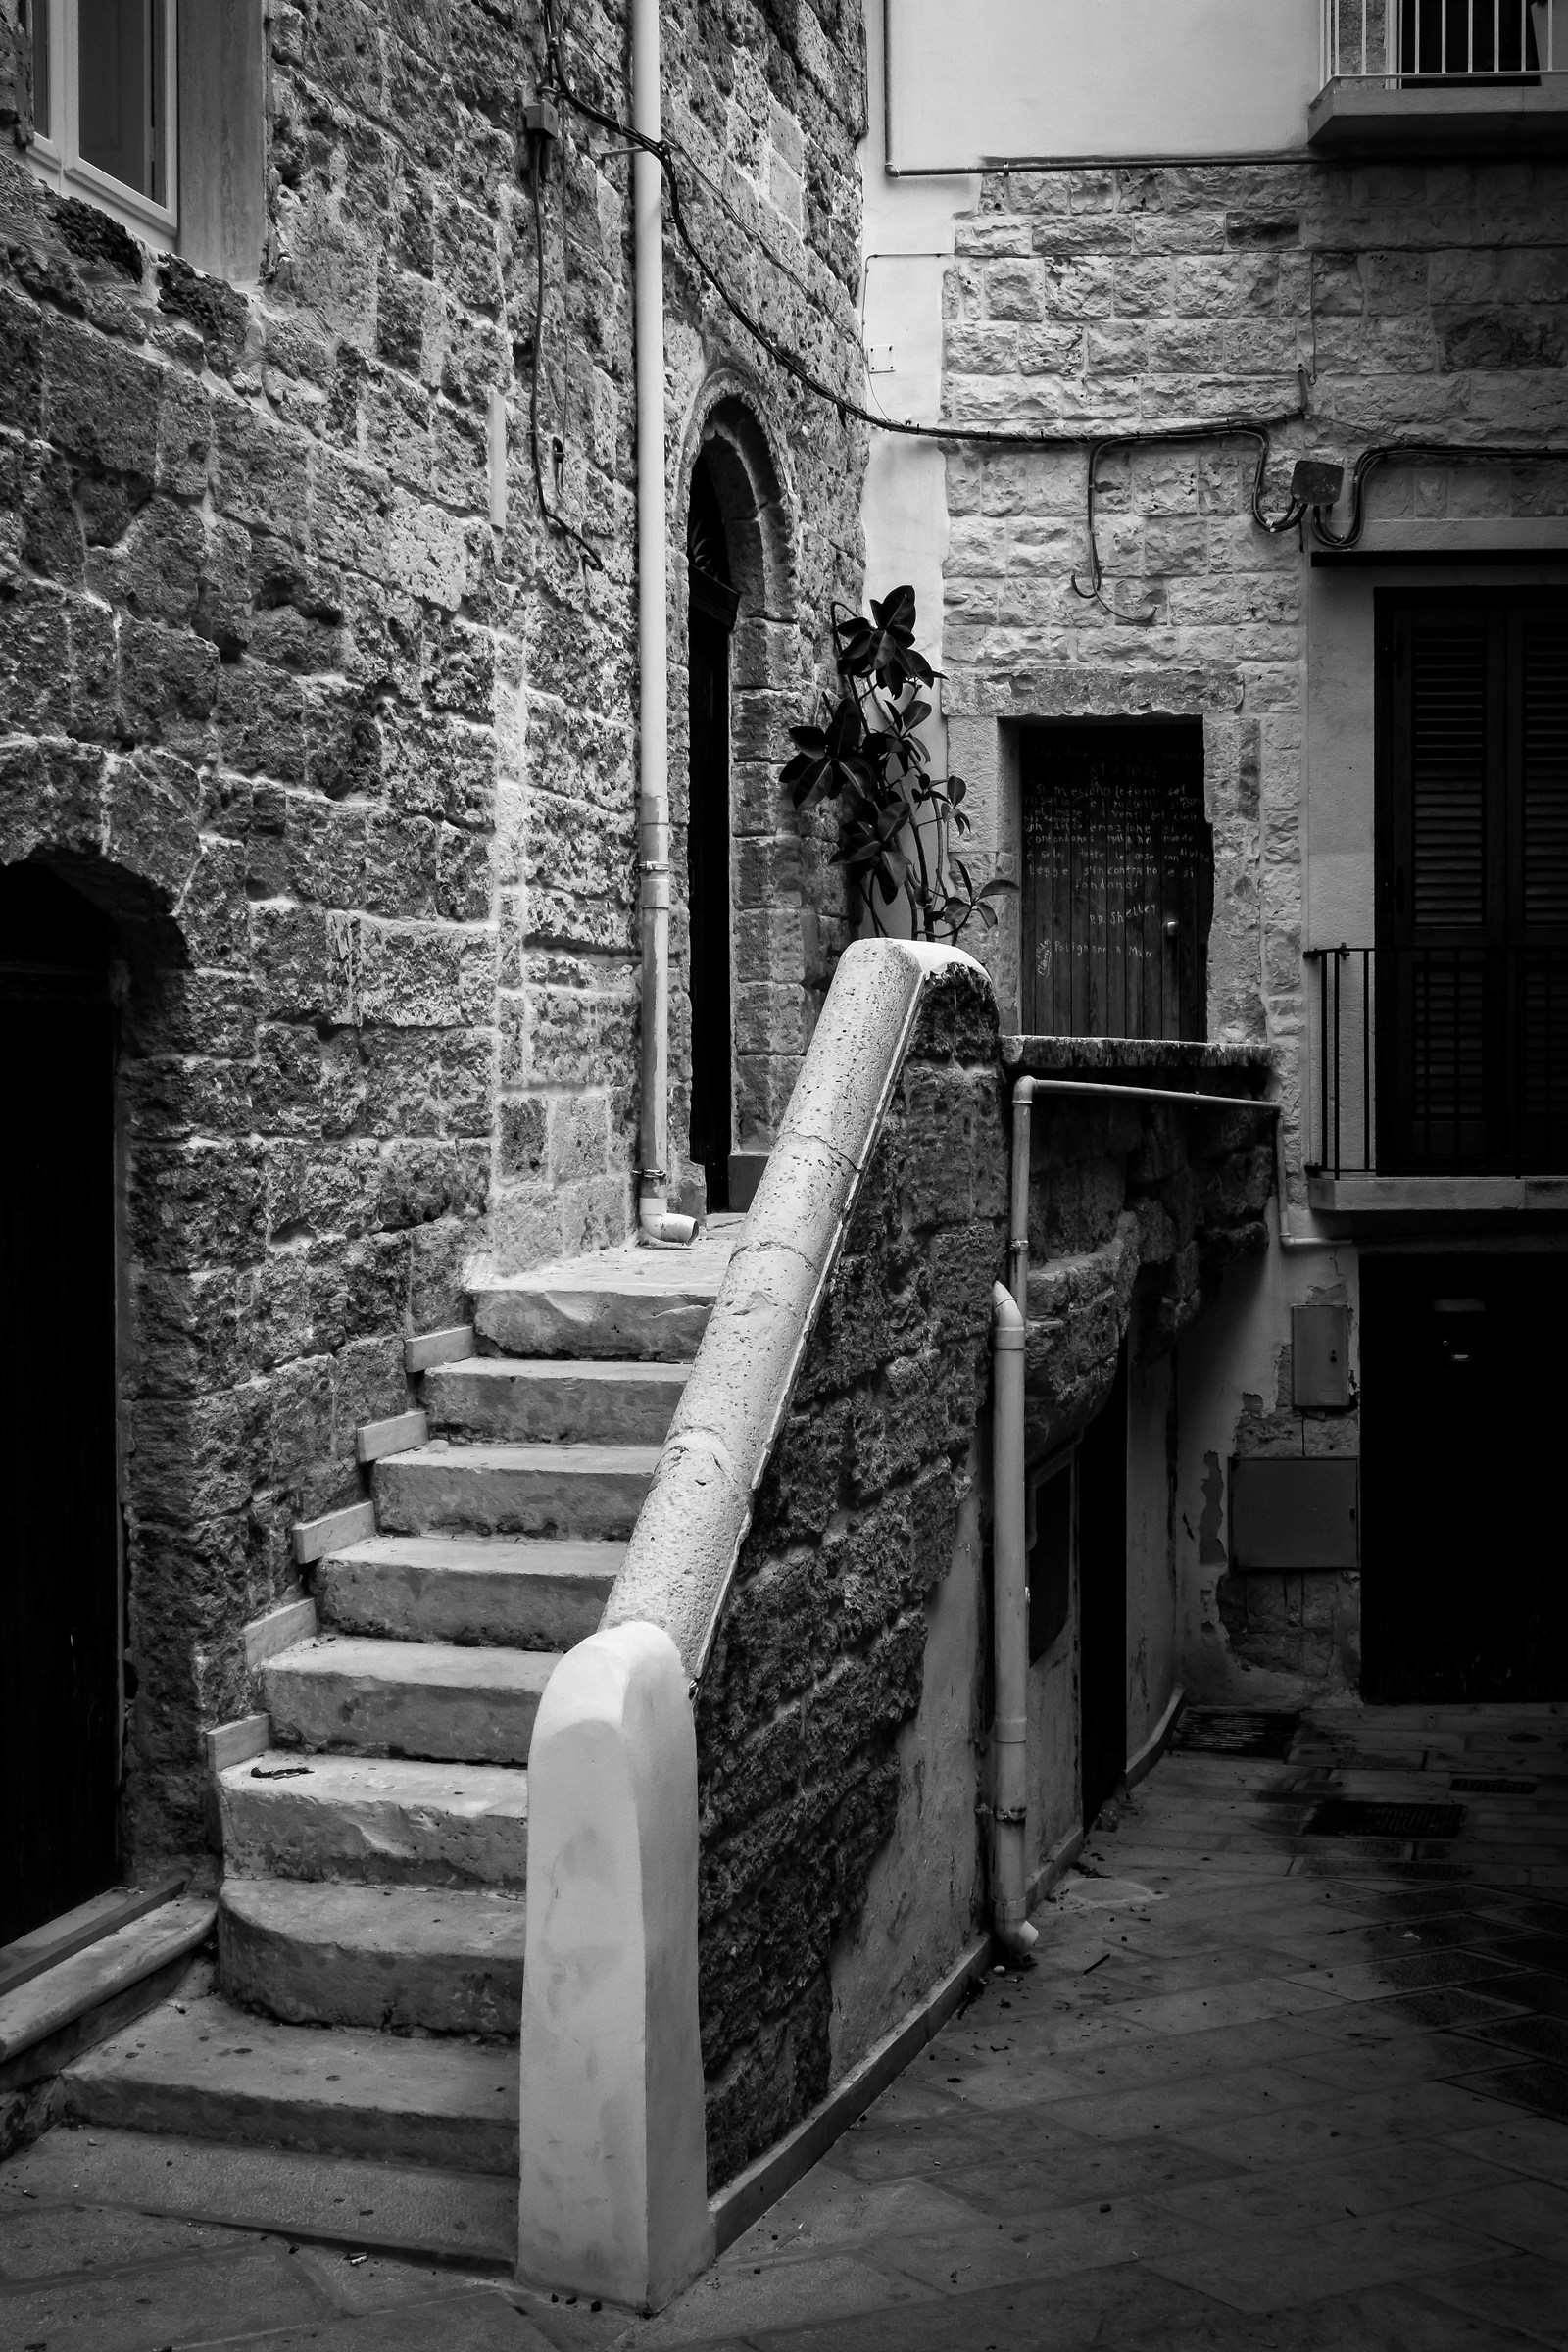 The alleys of Polignano......